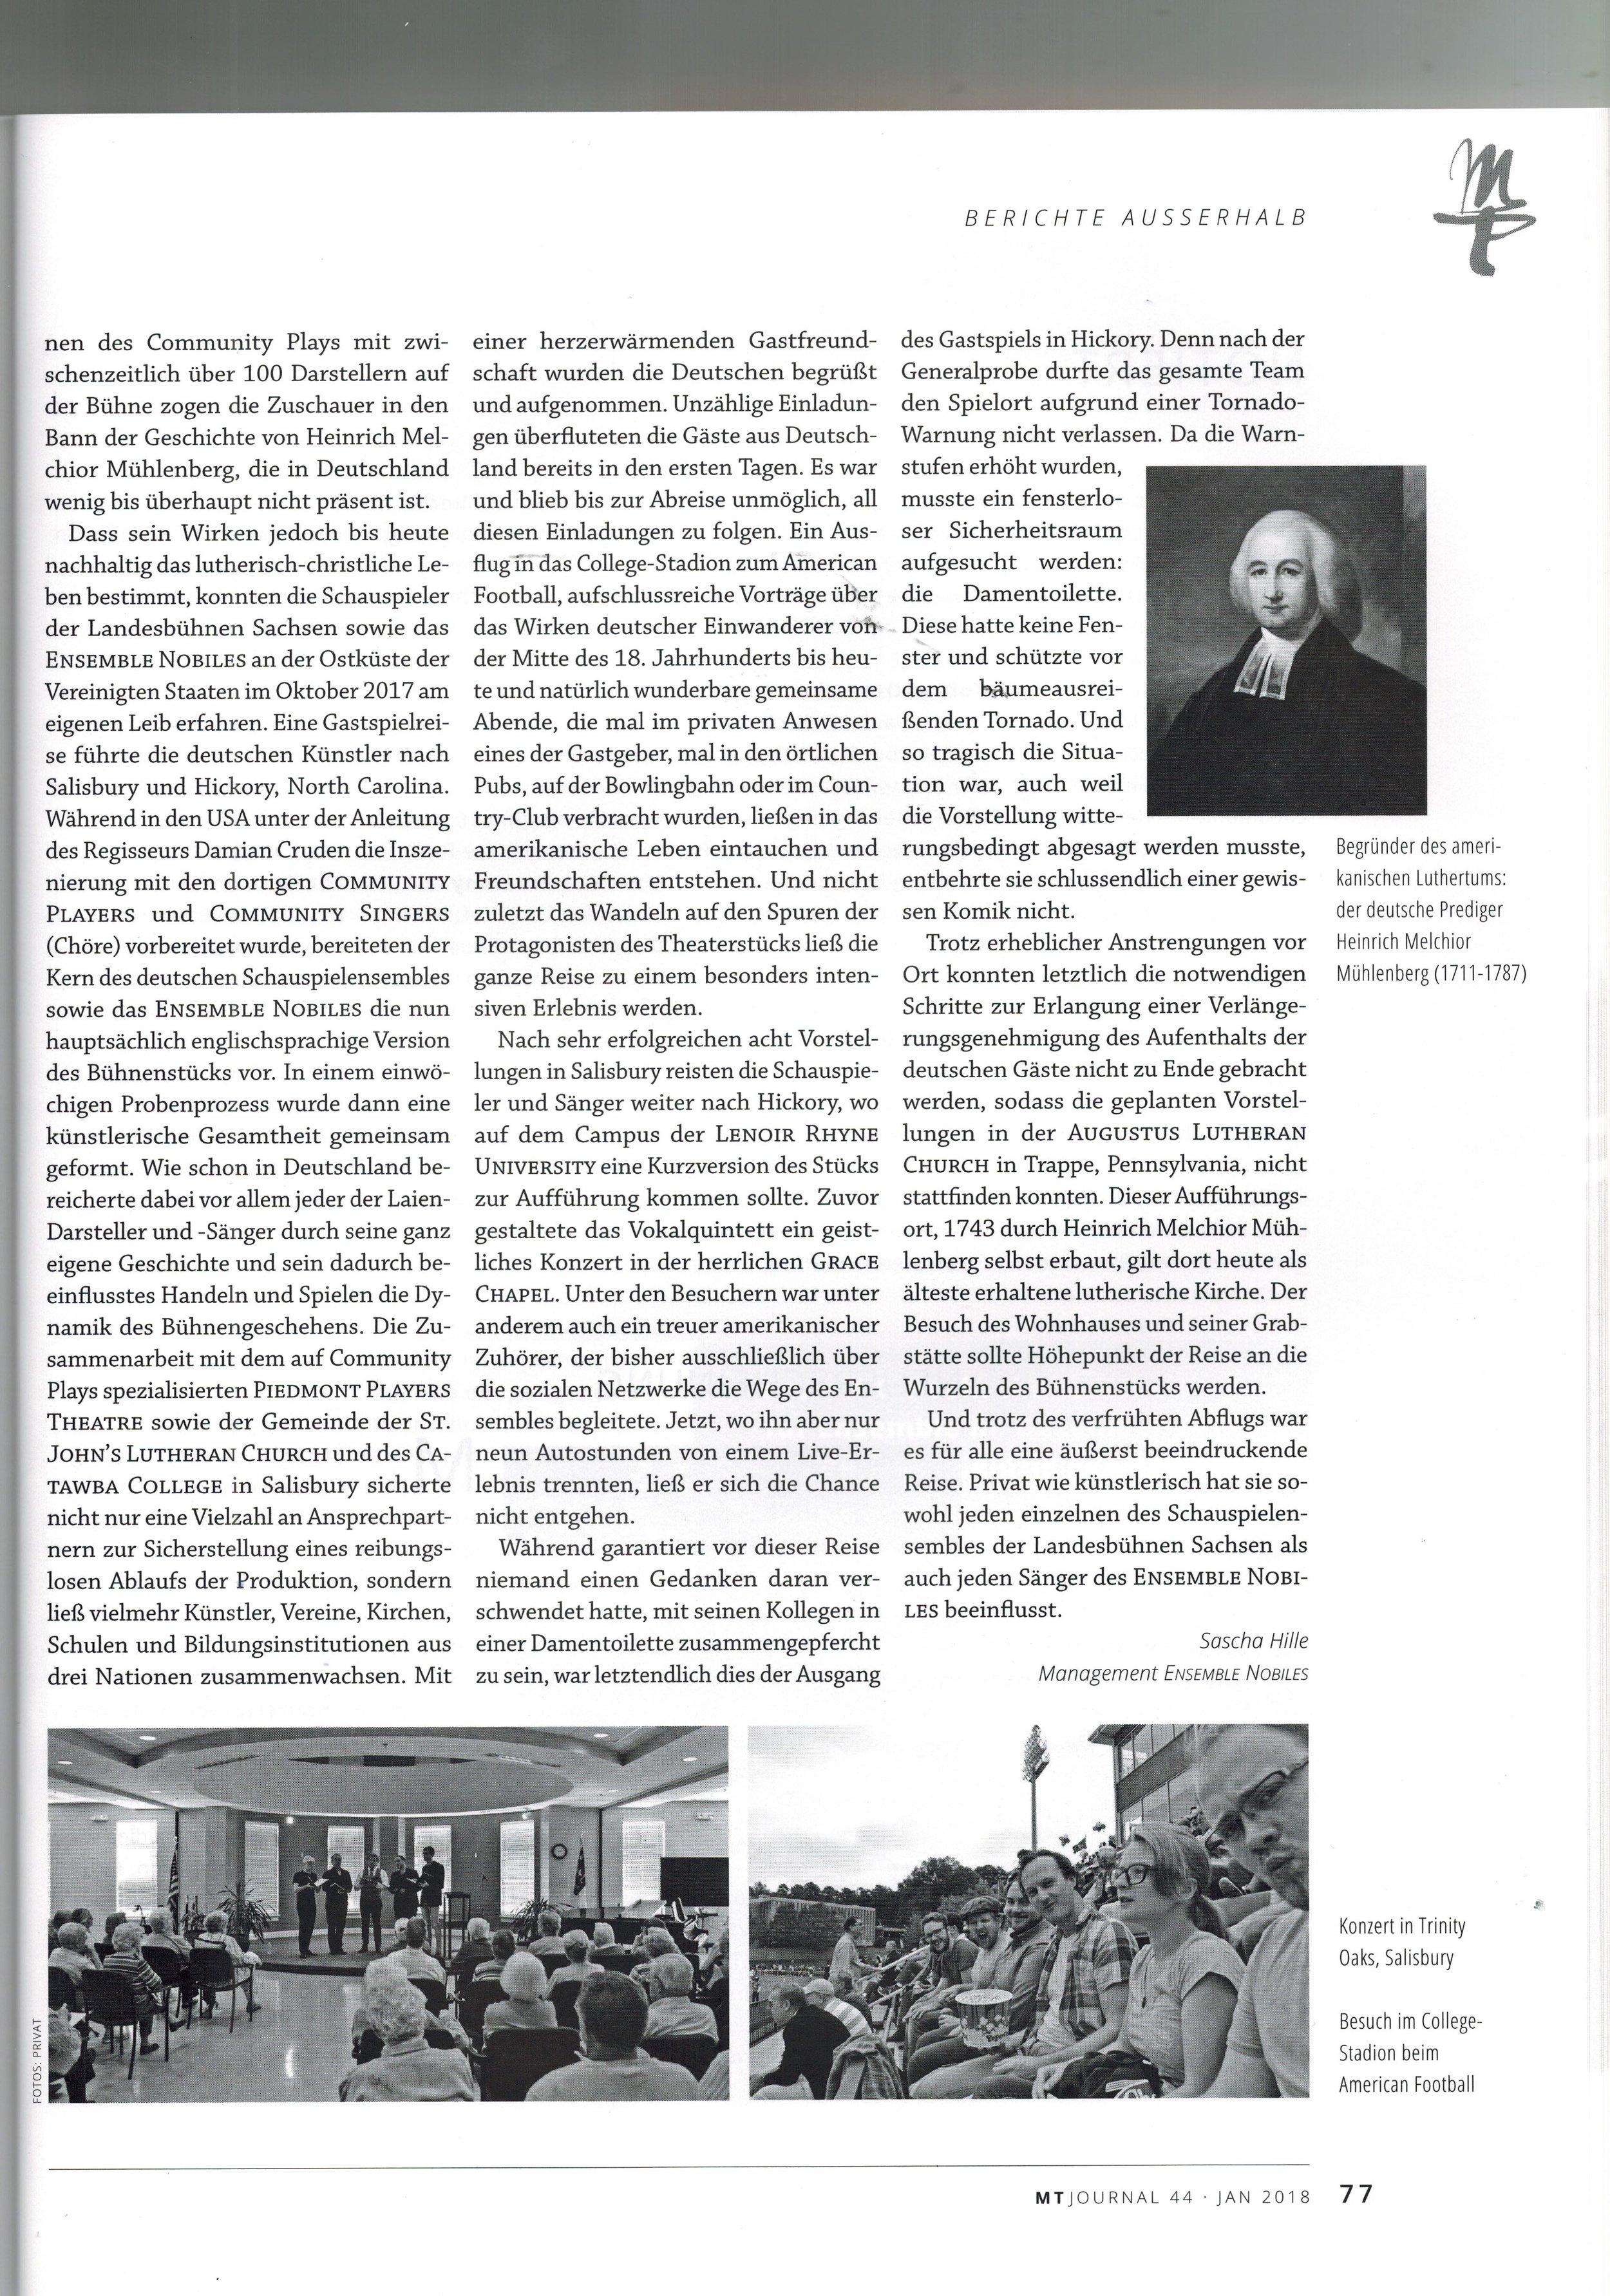 MT Journal  44 Januar - Wintersemester 2018 - S. 77